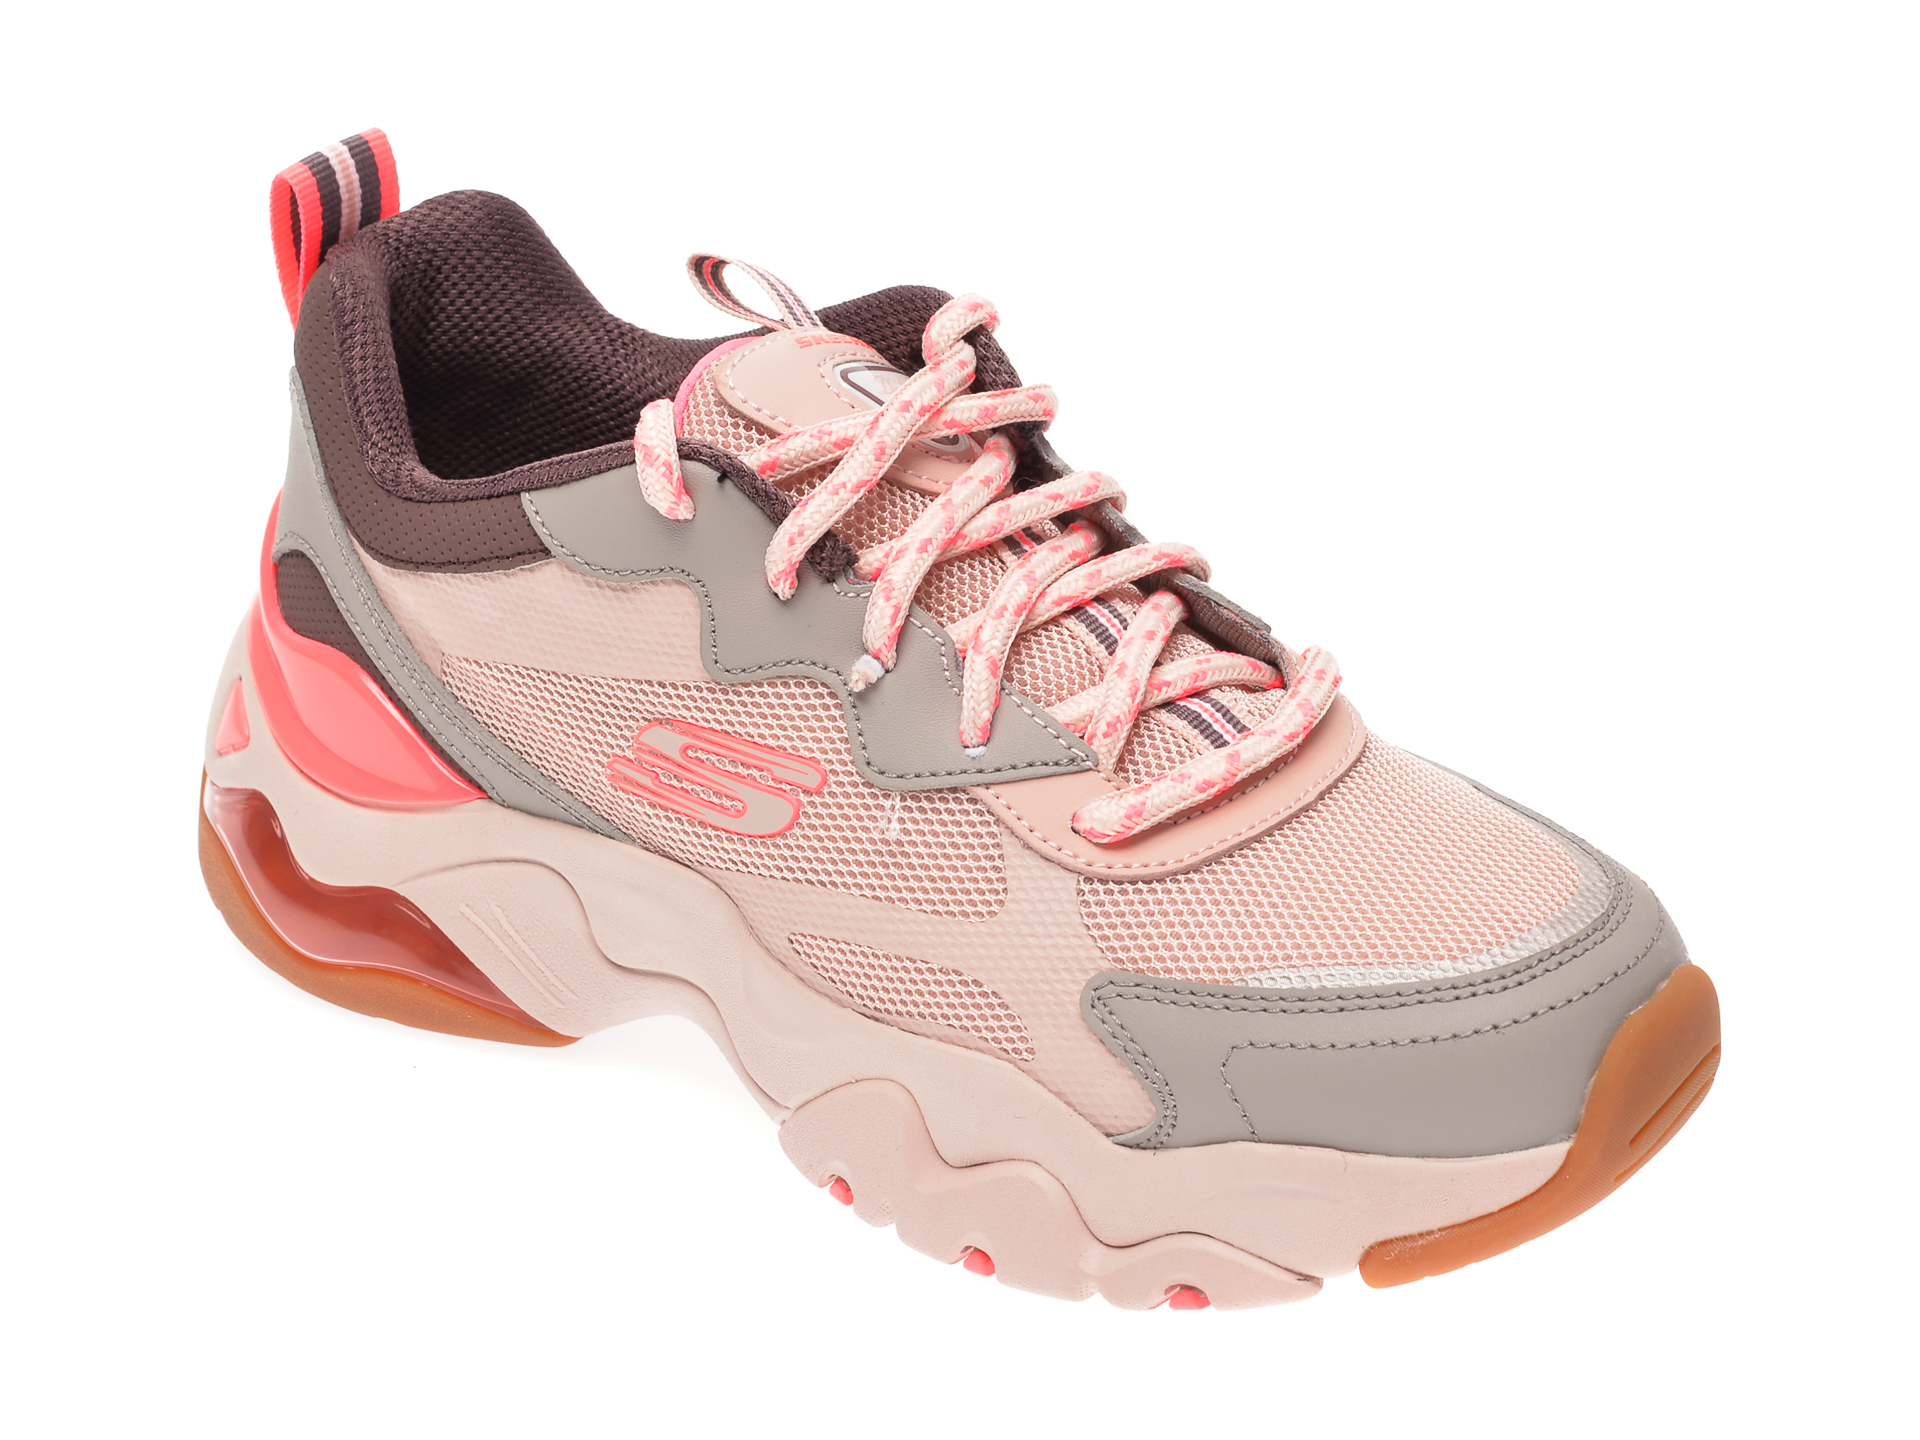 Pantofi Sport Skechers Multicolor, Dlites 3.0 Air, Din Material Textil Si Piele Naturala